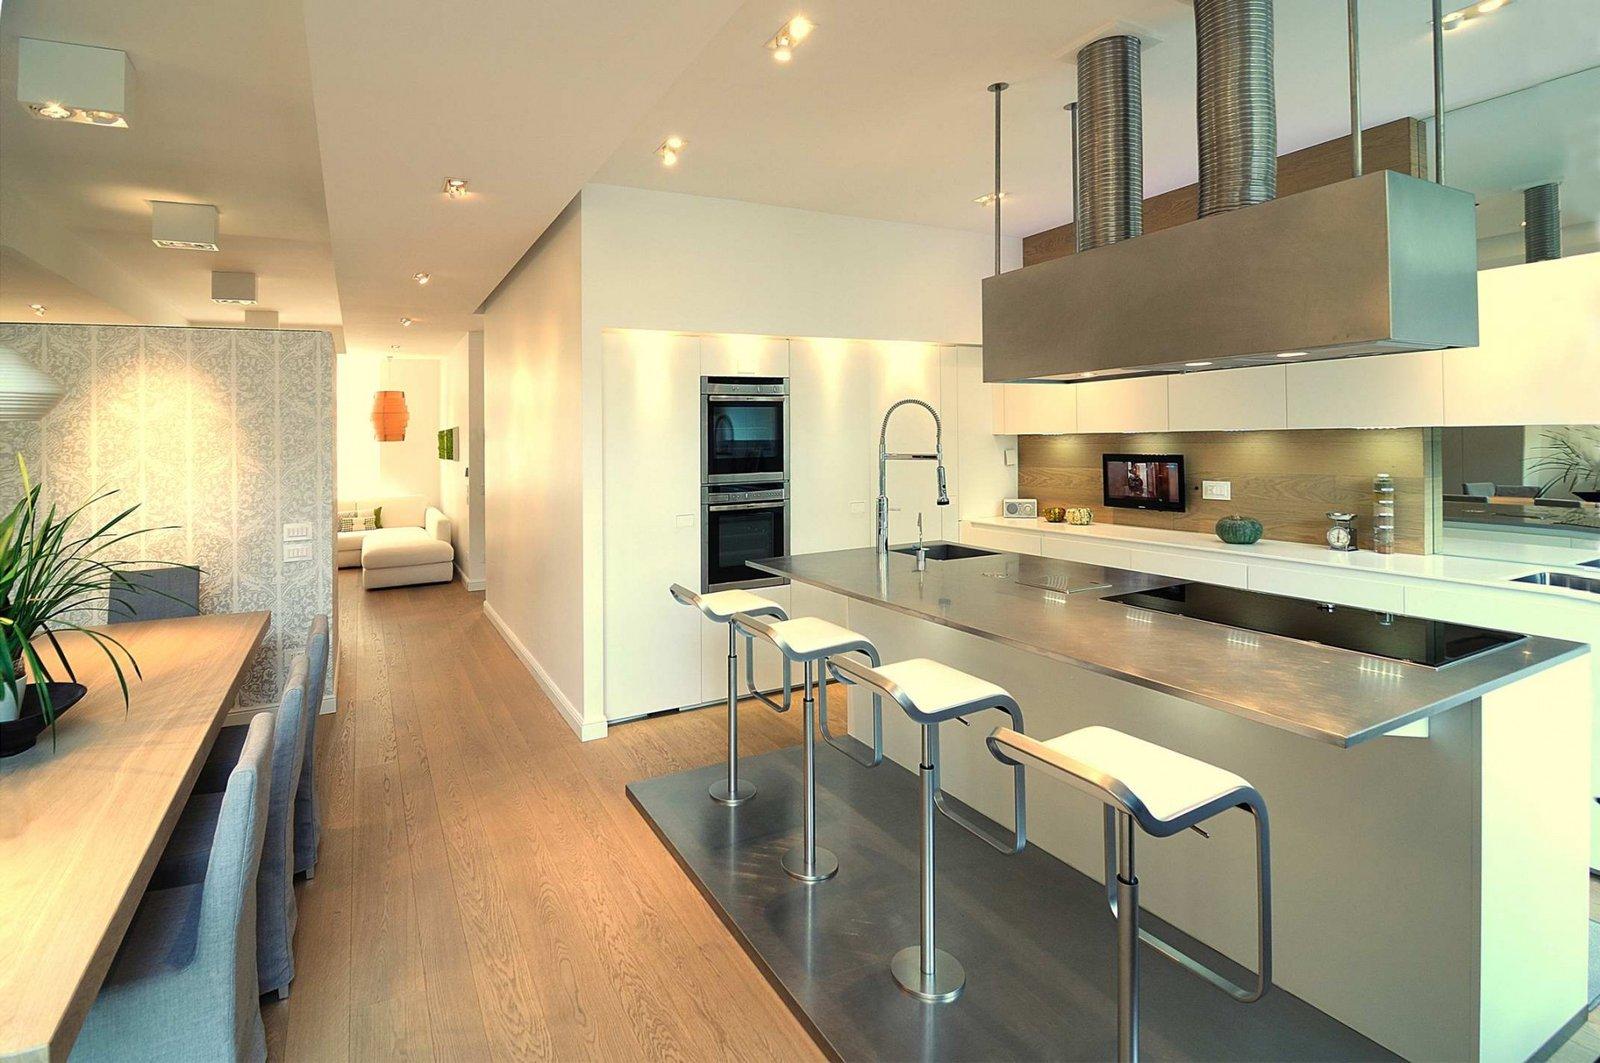 Ristrutturare casa i vantaggi di affidarsi ad un general - Ristrutturare casa idee ...